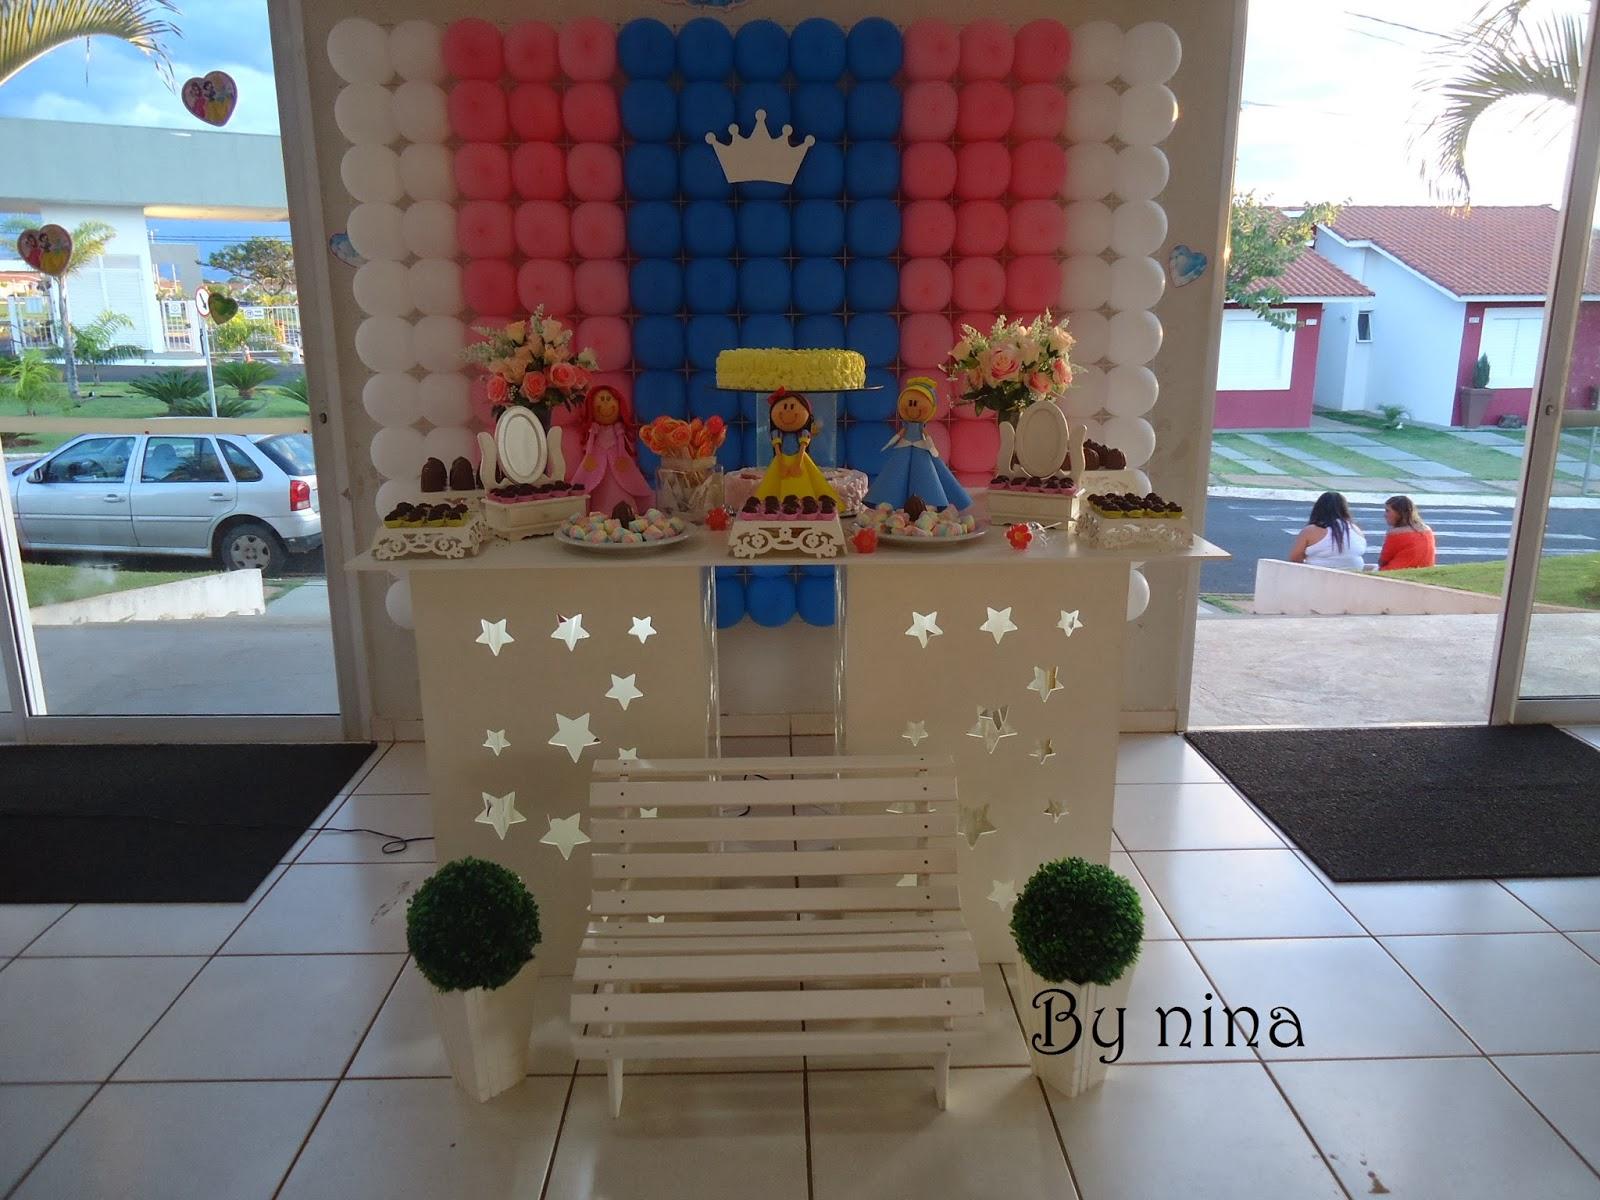 Aparador Suspenso Ikea ~ Nina Ateli u00ea Decoraç u00e3o Infantil em Uberl u00e2ndia